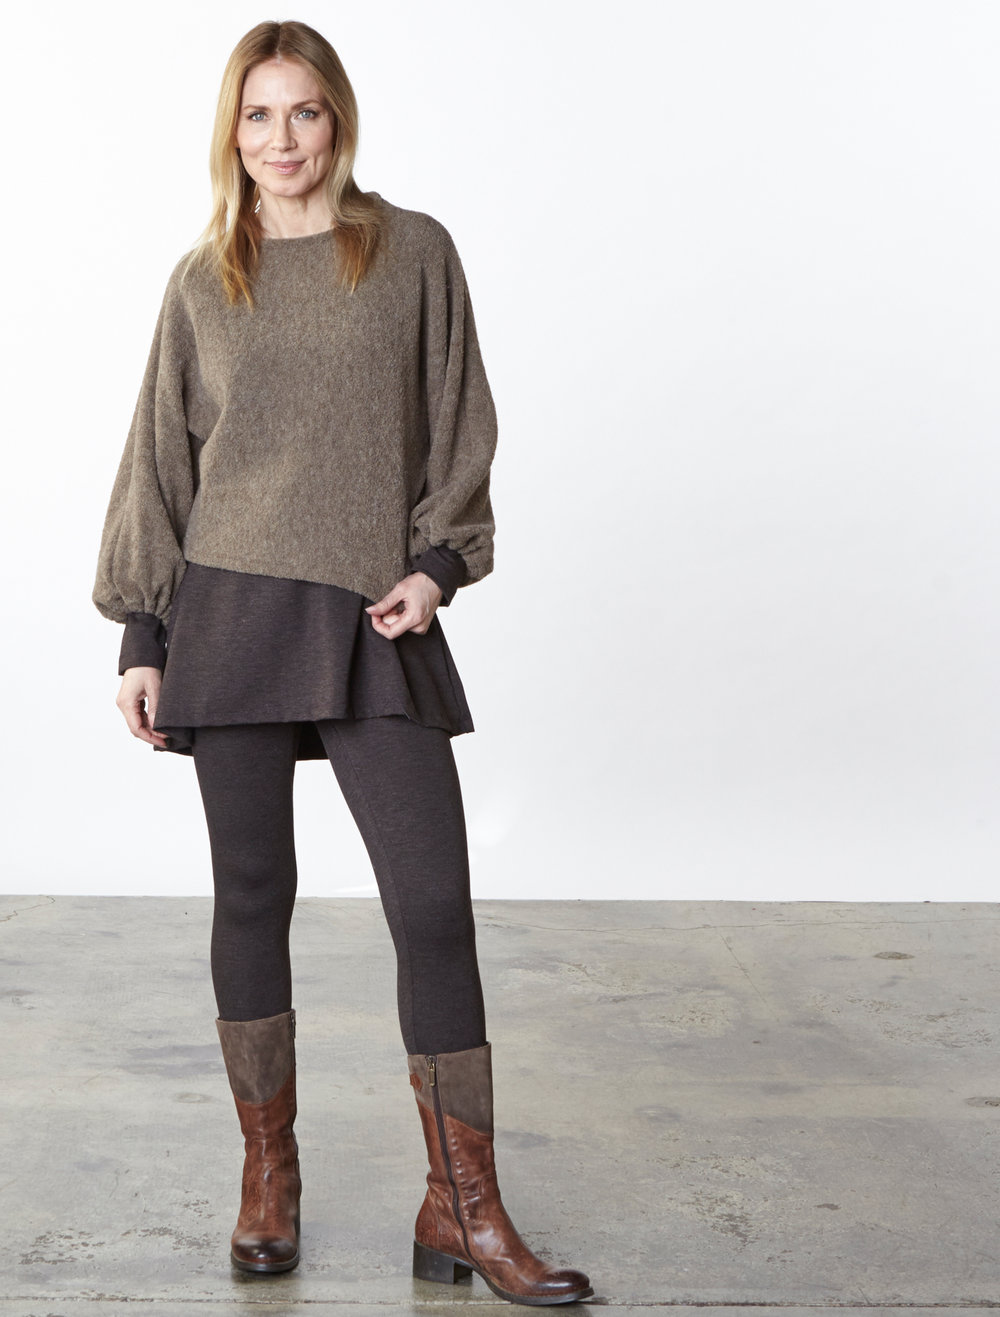 Anna Sweater in Taupe Italian Wool, Liam Tunic, Legging in Chocolate Italian Melange